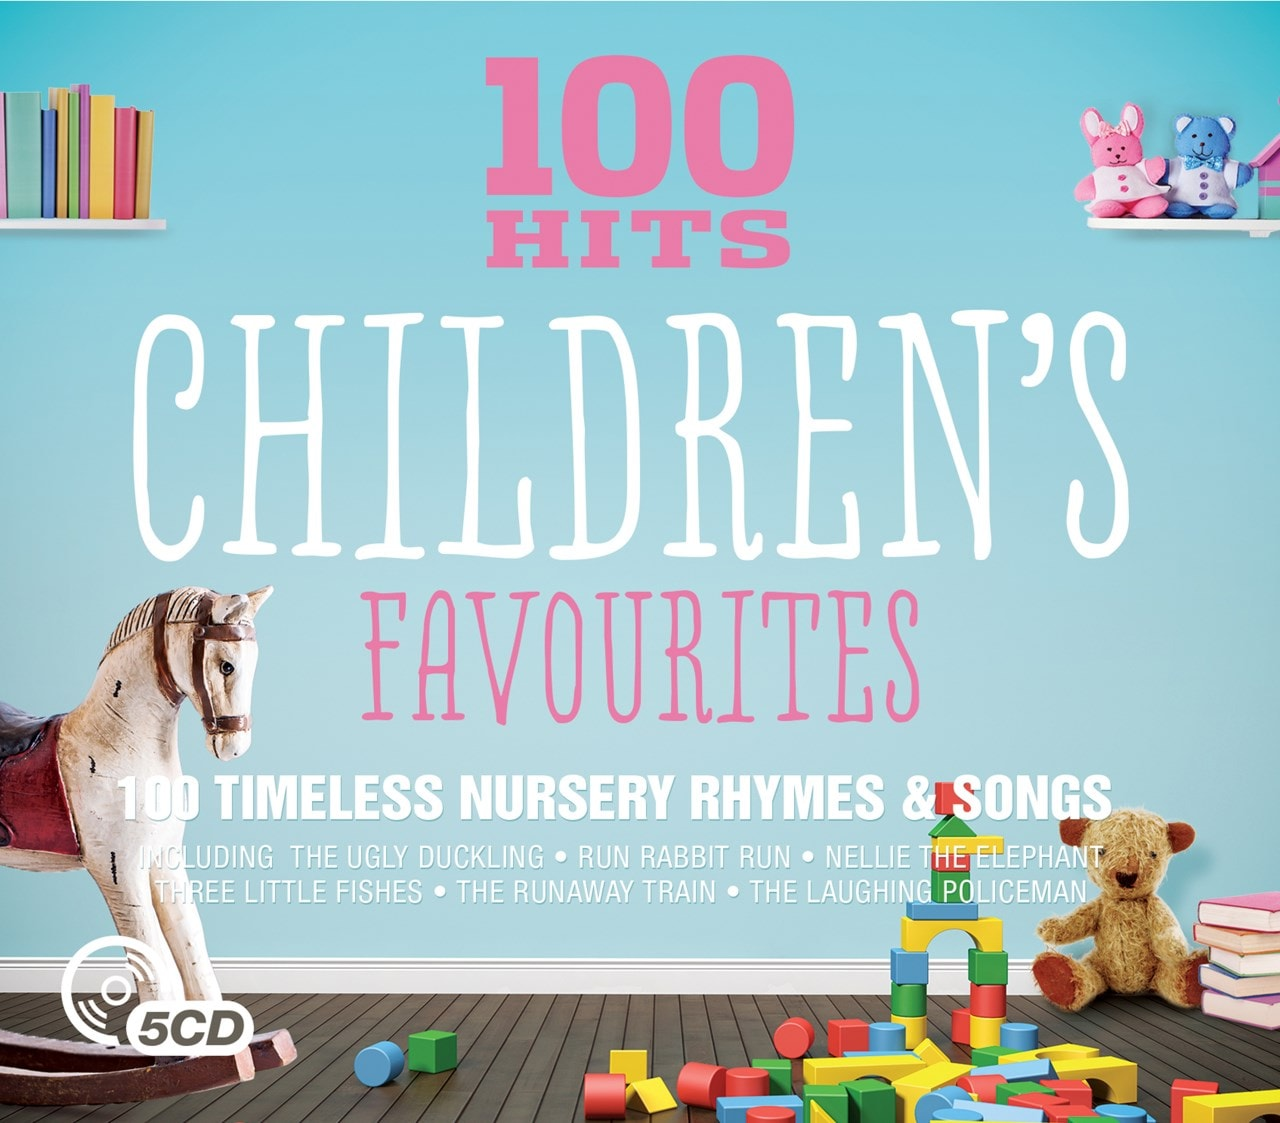 100 Hits: Children's Favourites - 1